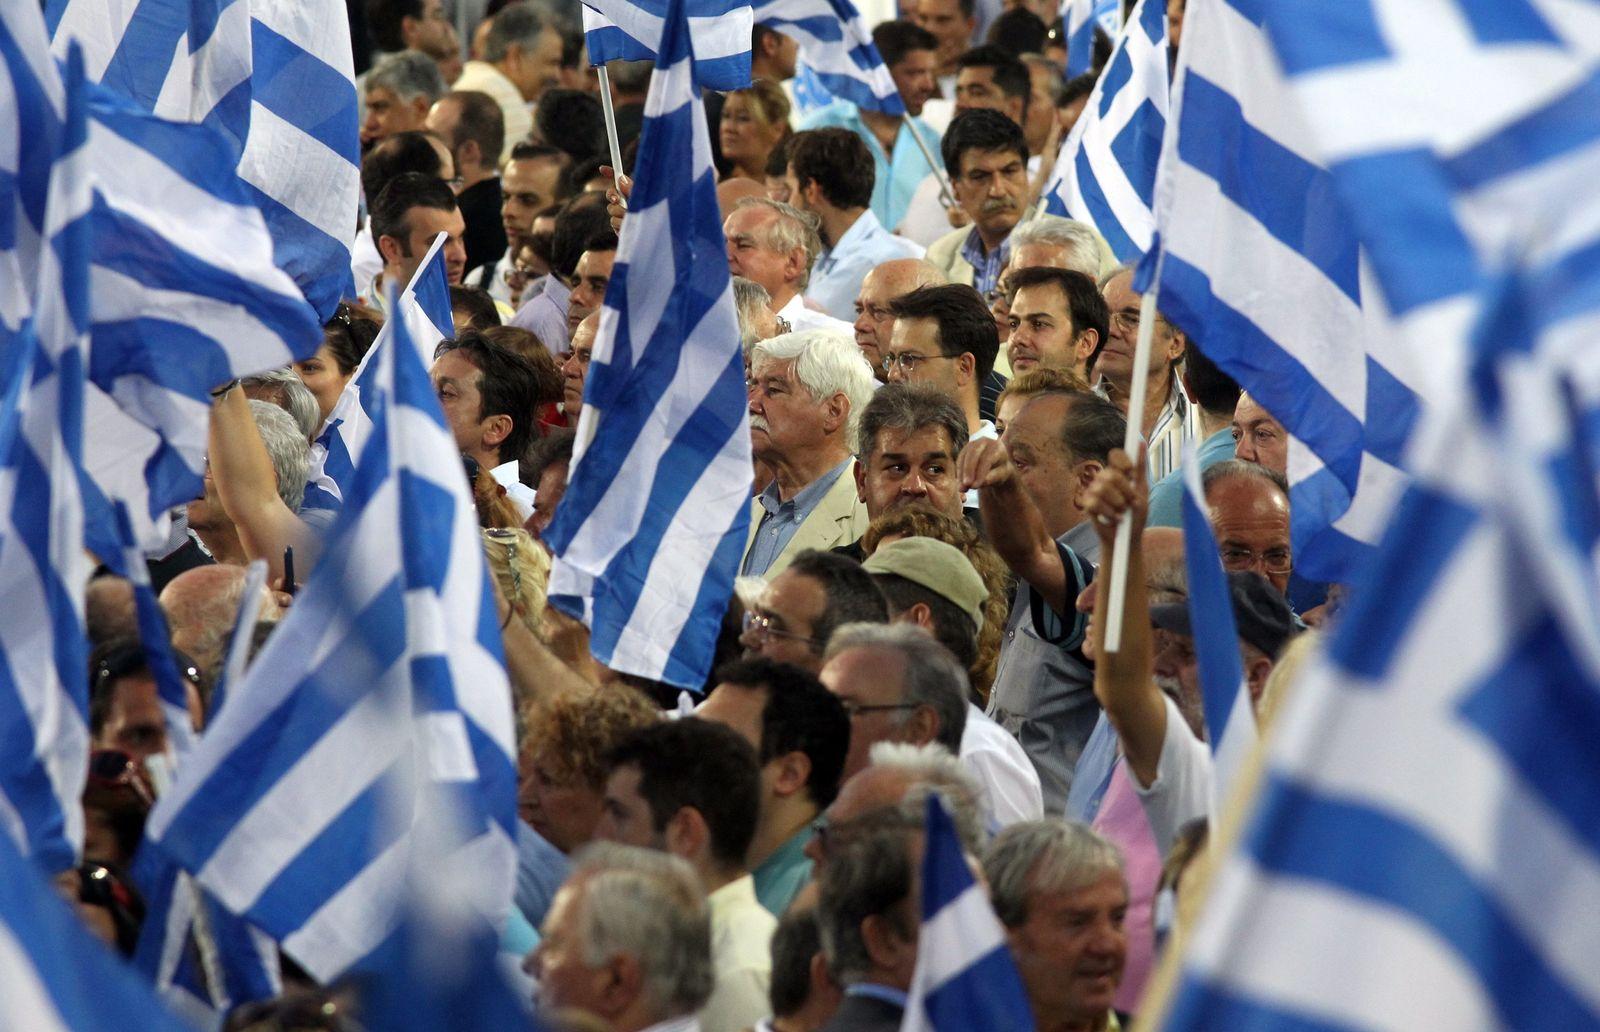 Wahlen Griechenland/ Flaggen